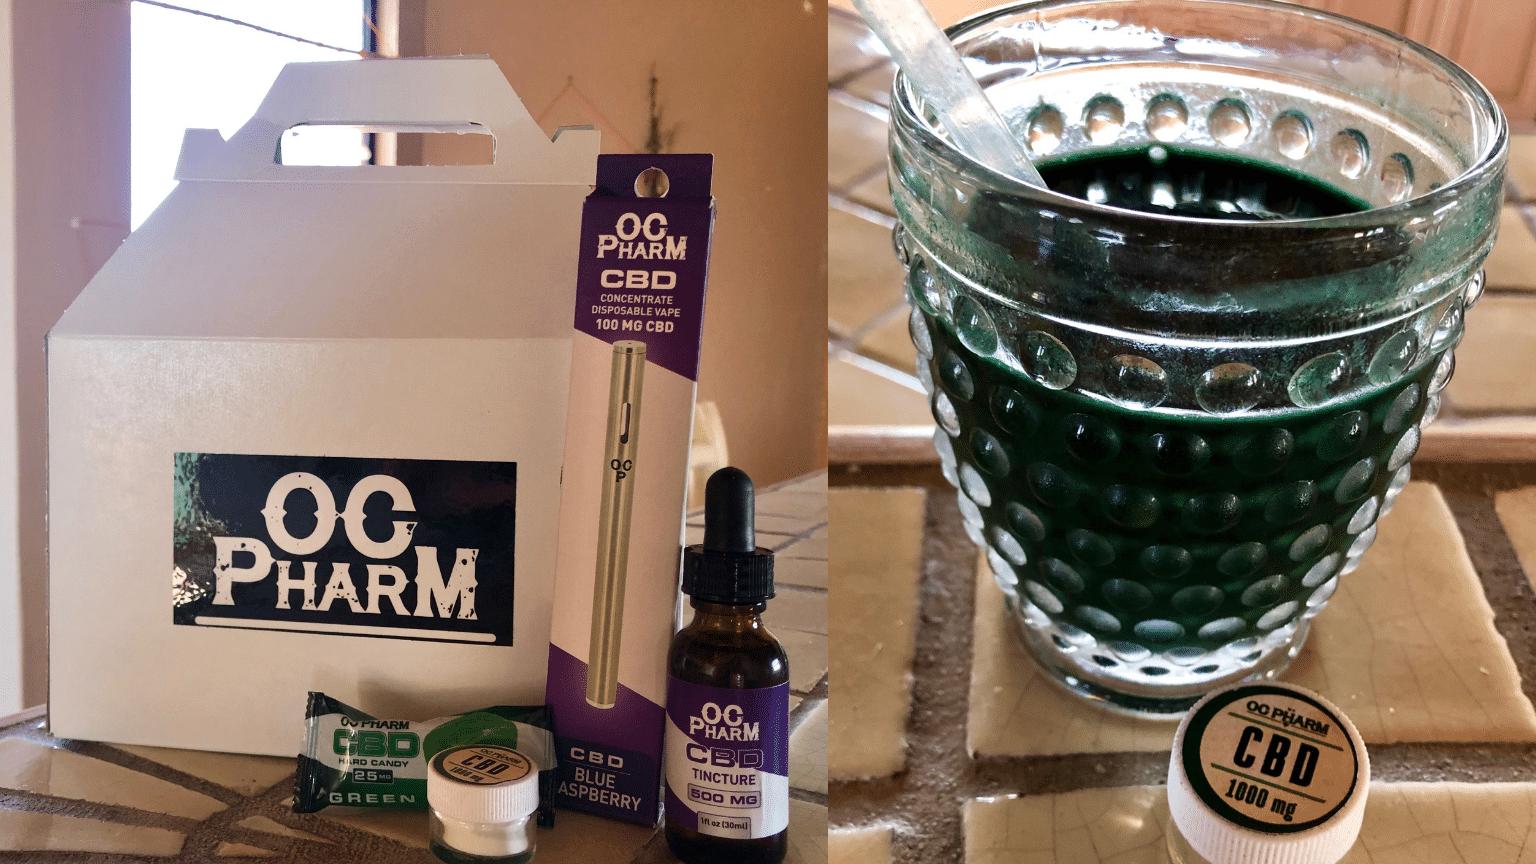 oc-pharm-cbd-products